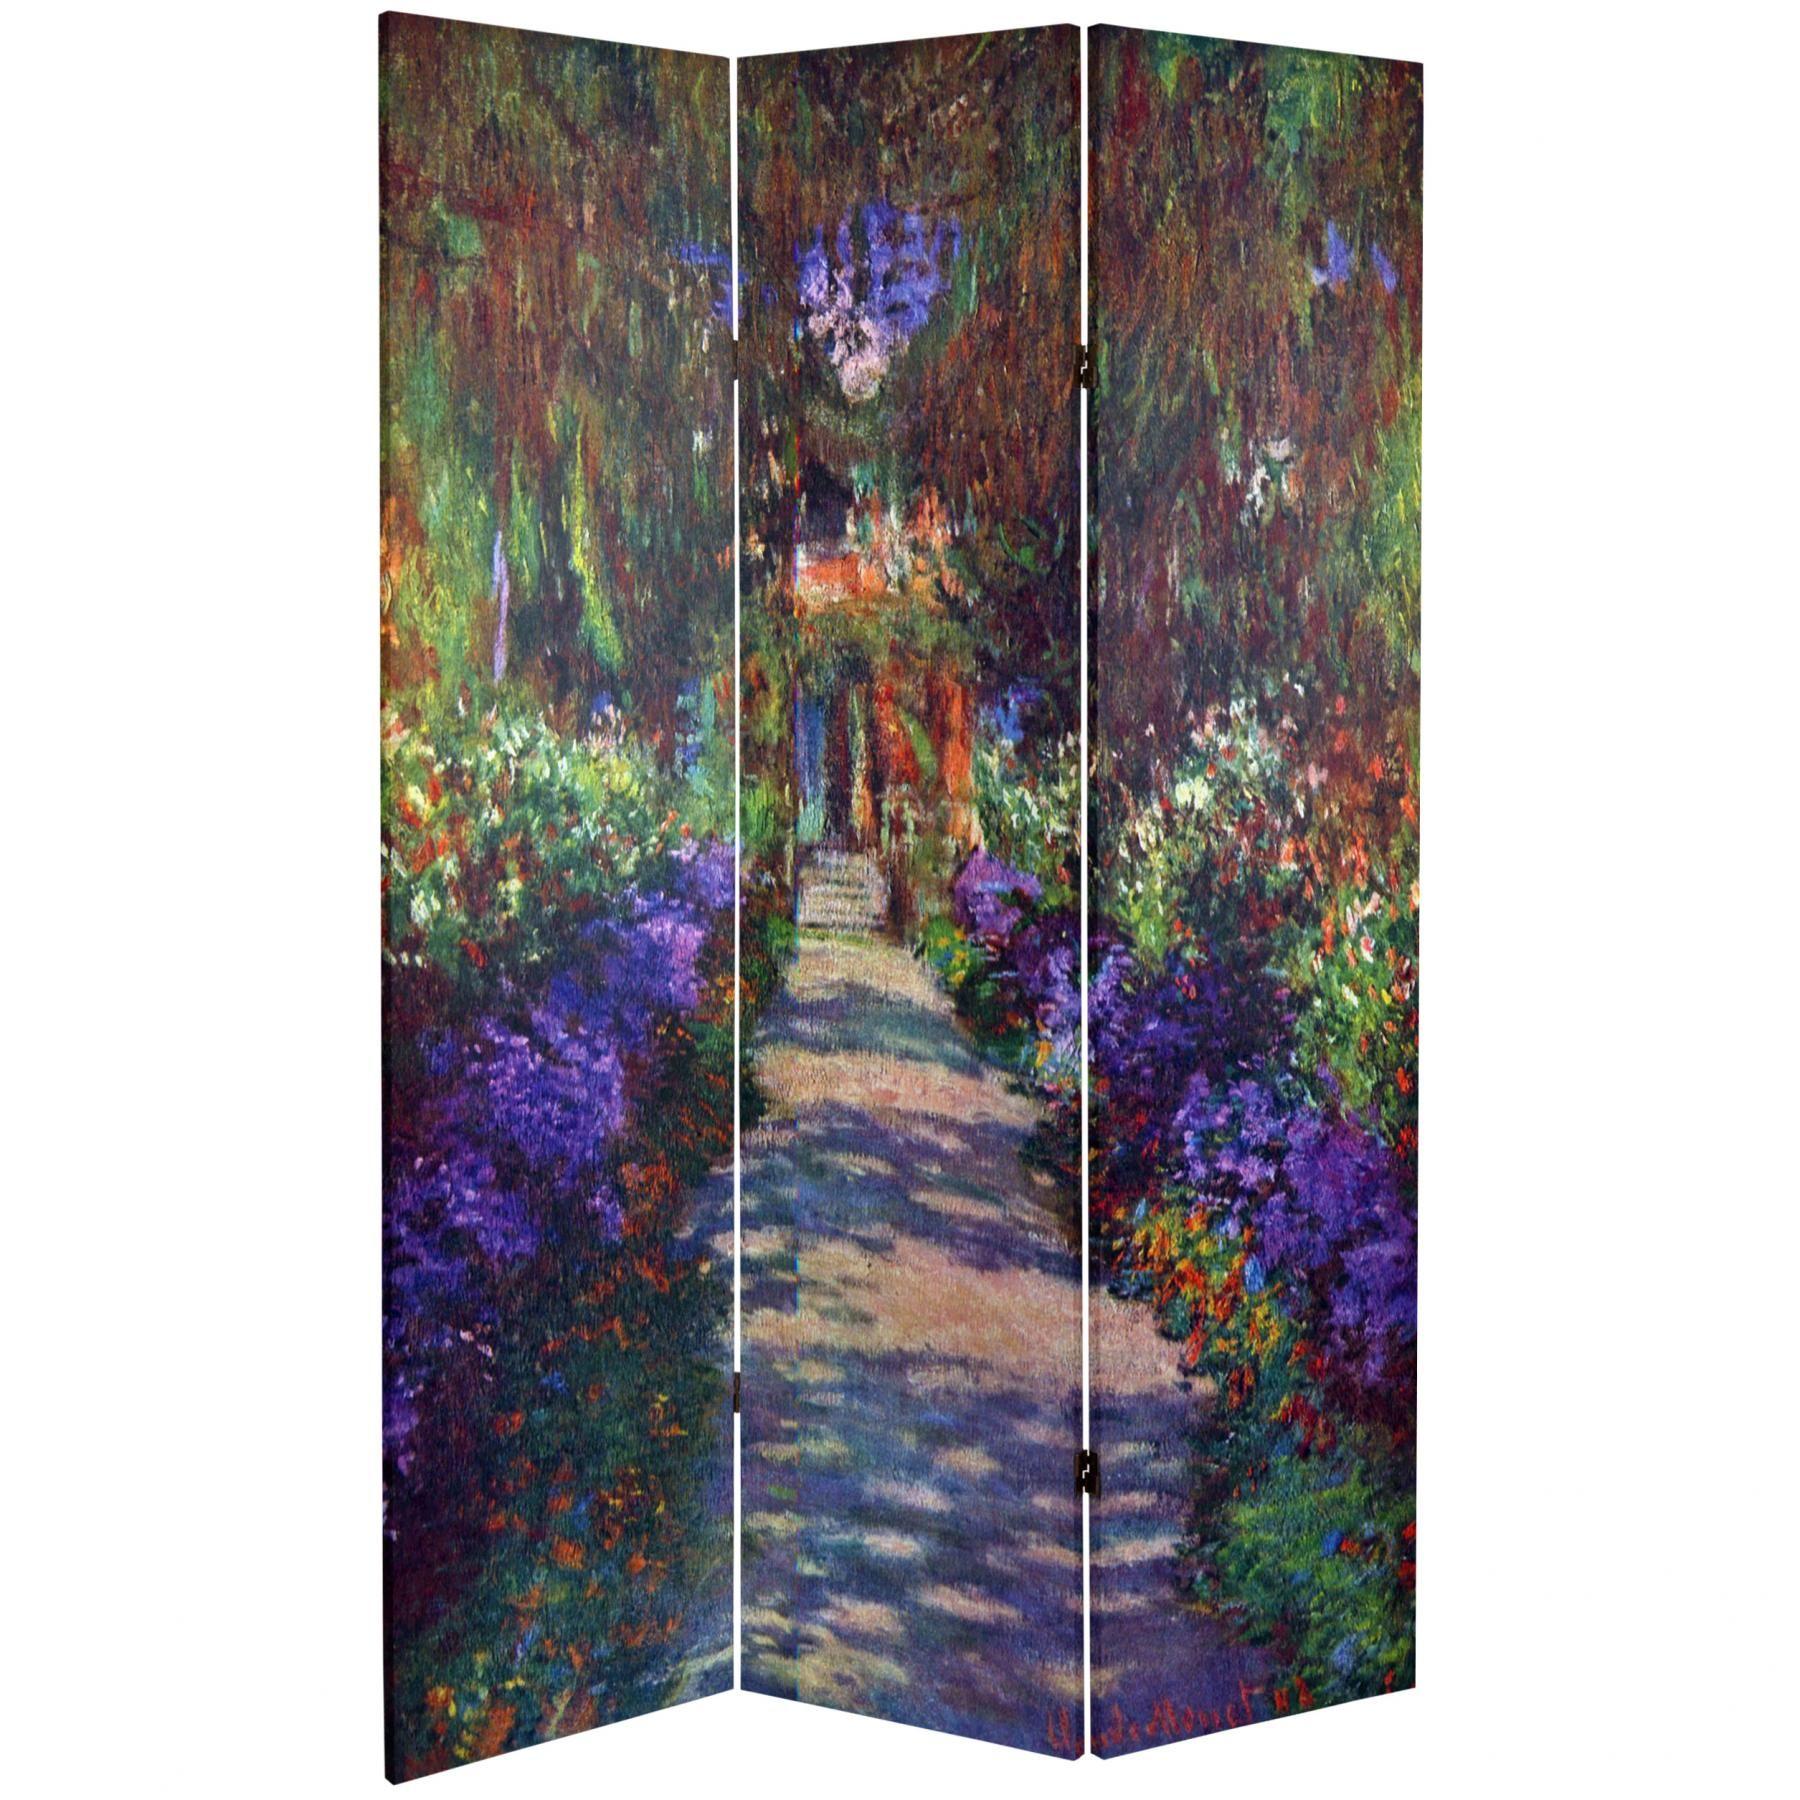 Works of Monet Canvas Room Divider